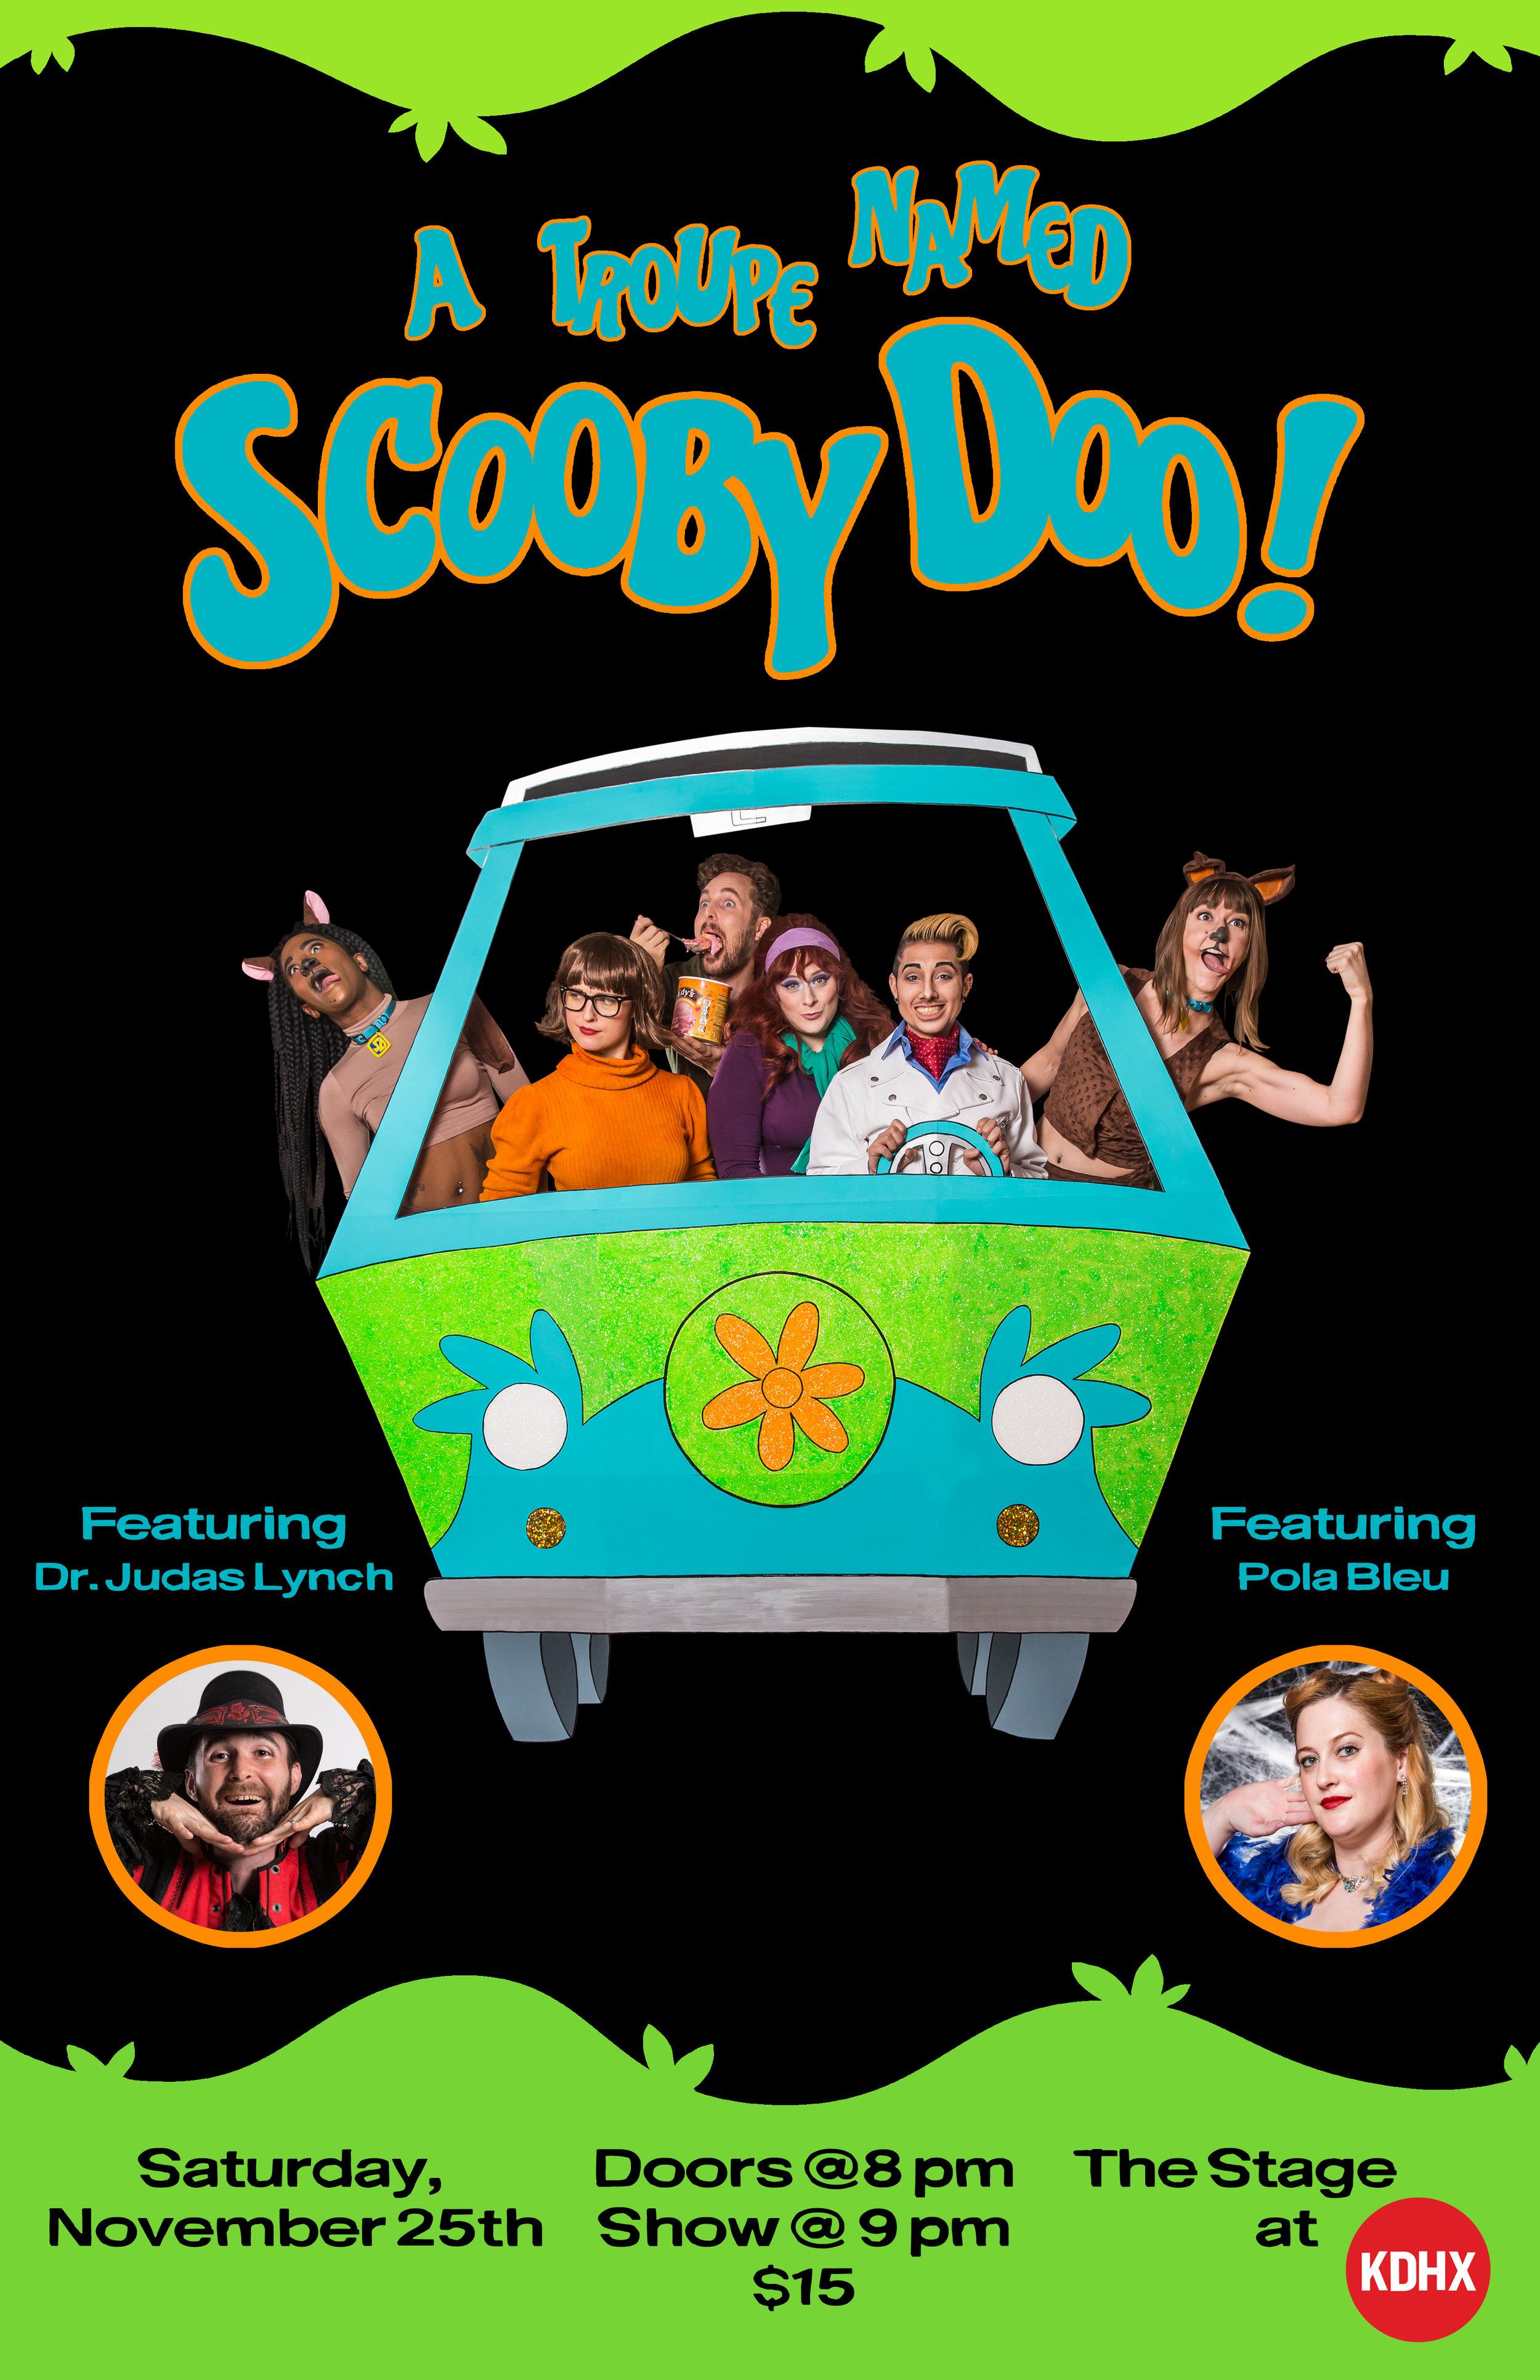 Scooby Doo Final.jpg